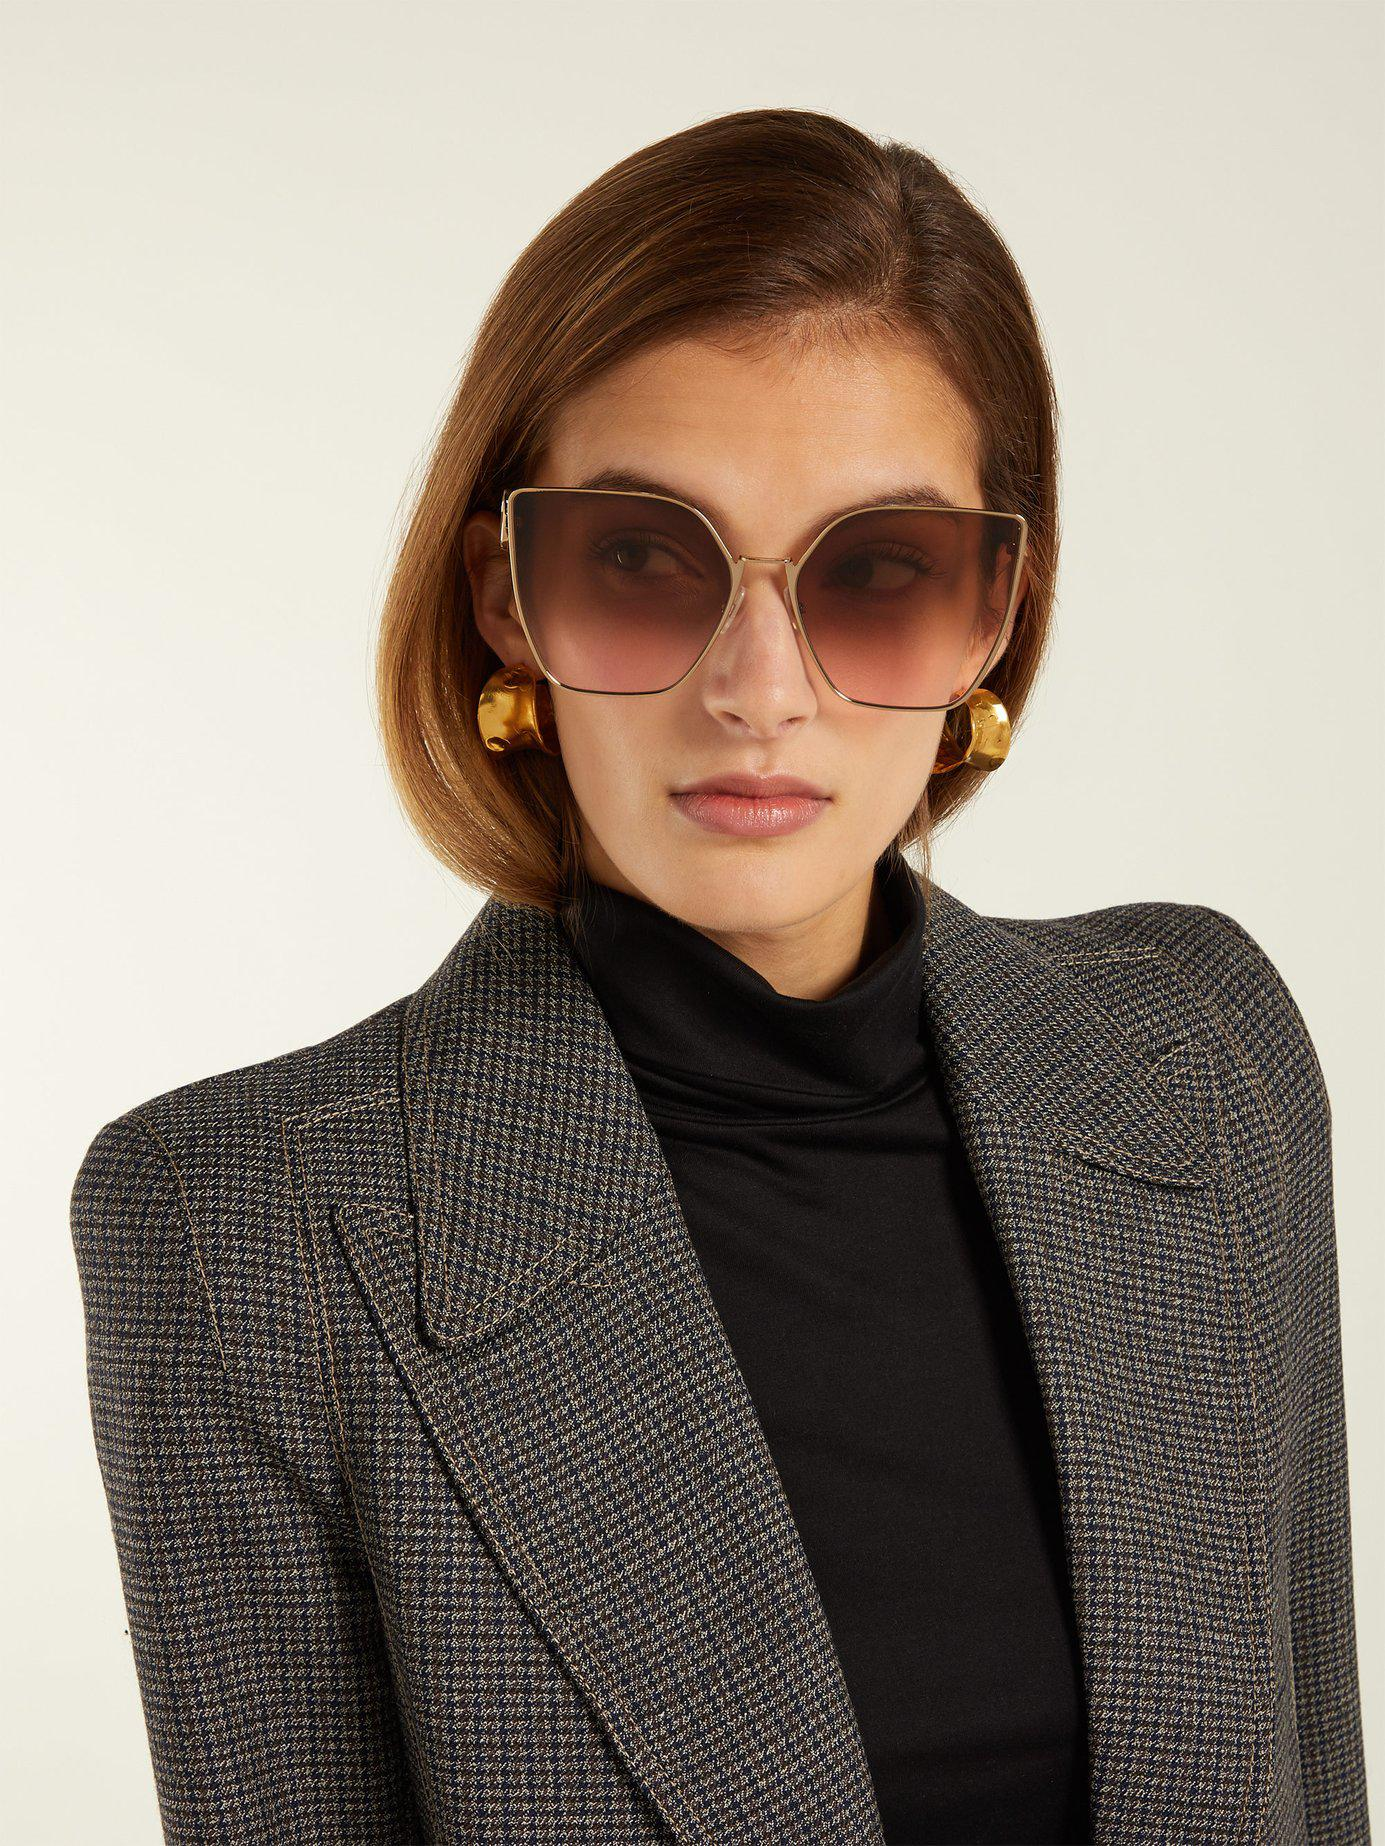 caac4dece5 Fendi F Is Cat Eye Metal Sunglasses in Metallic - Lyst